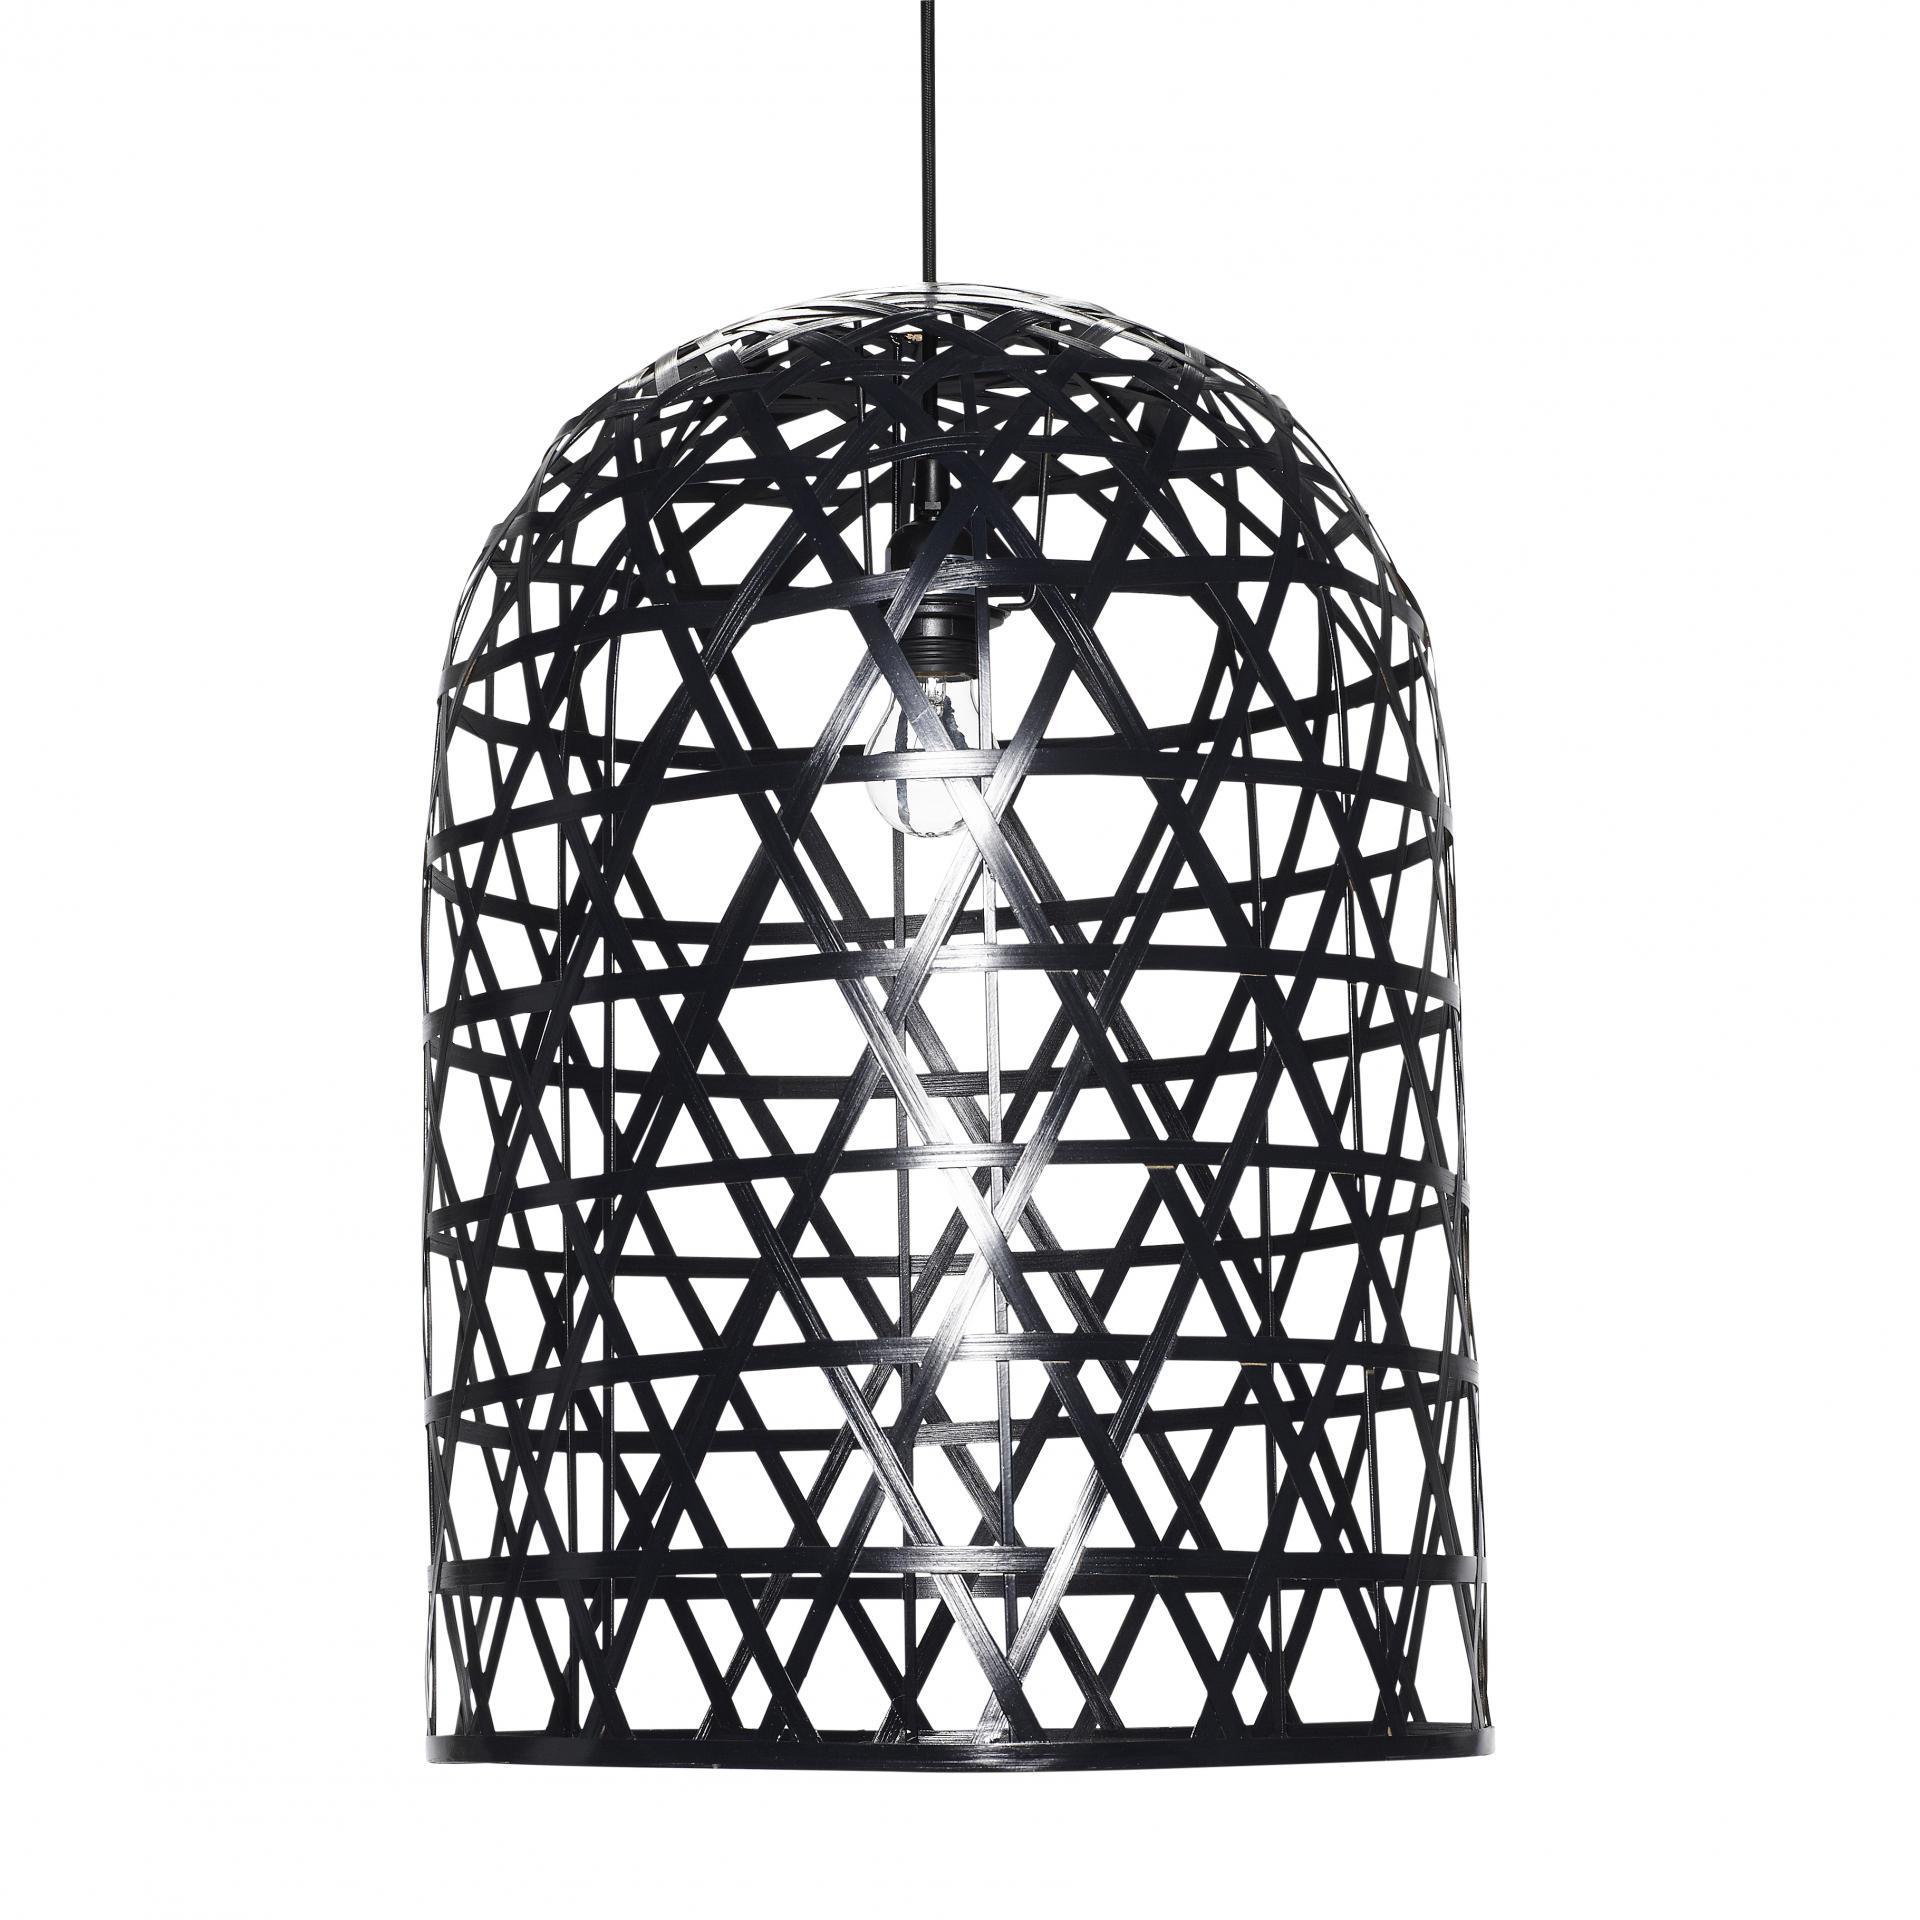 Hübsch Lampa Black bamboo long, černá barva, dřevo